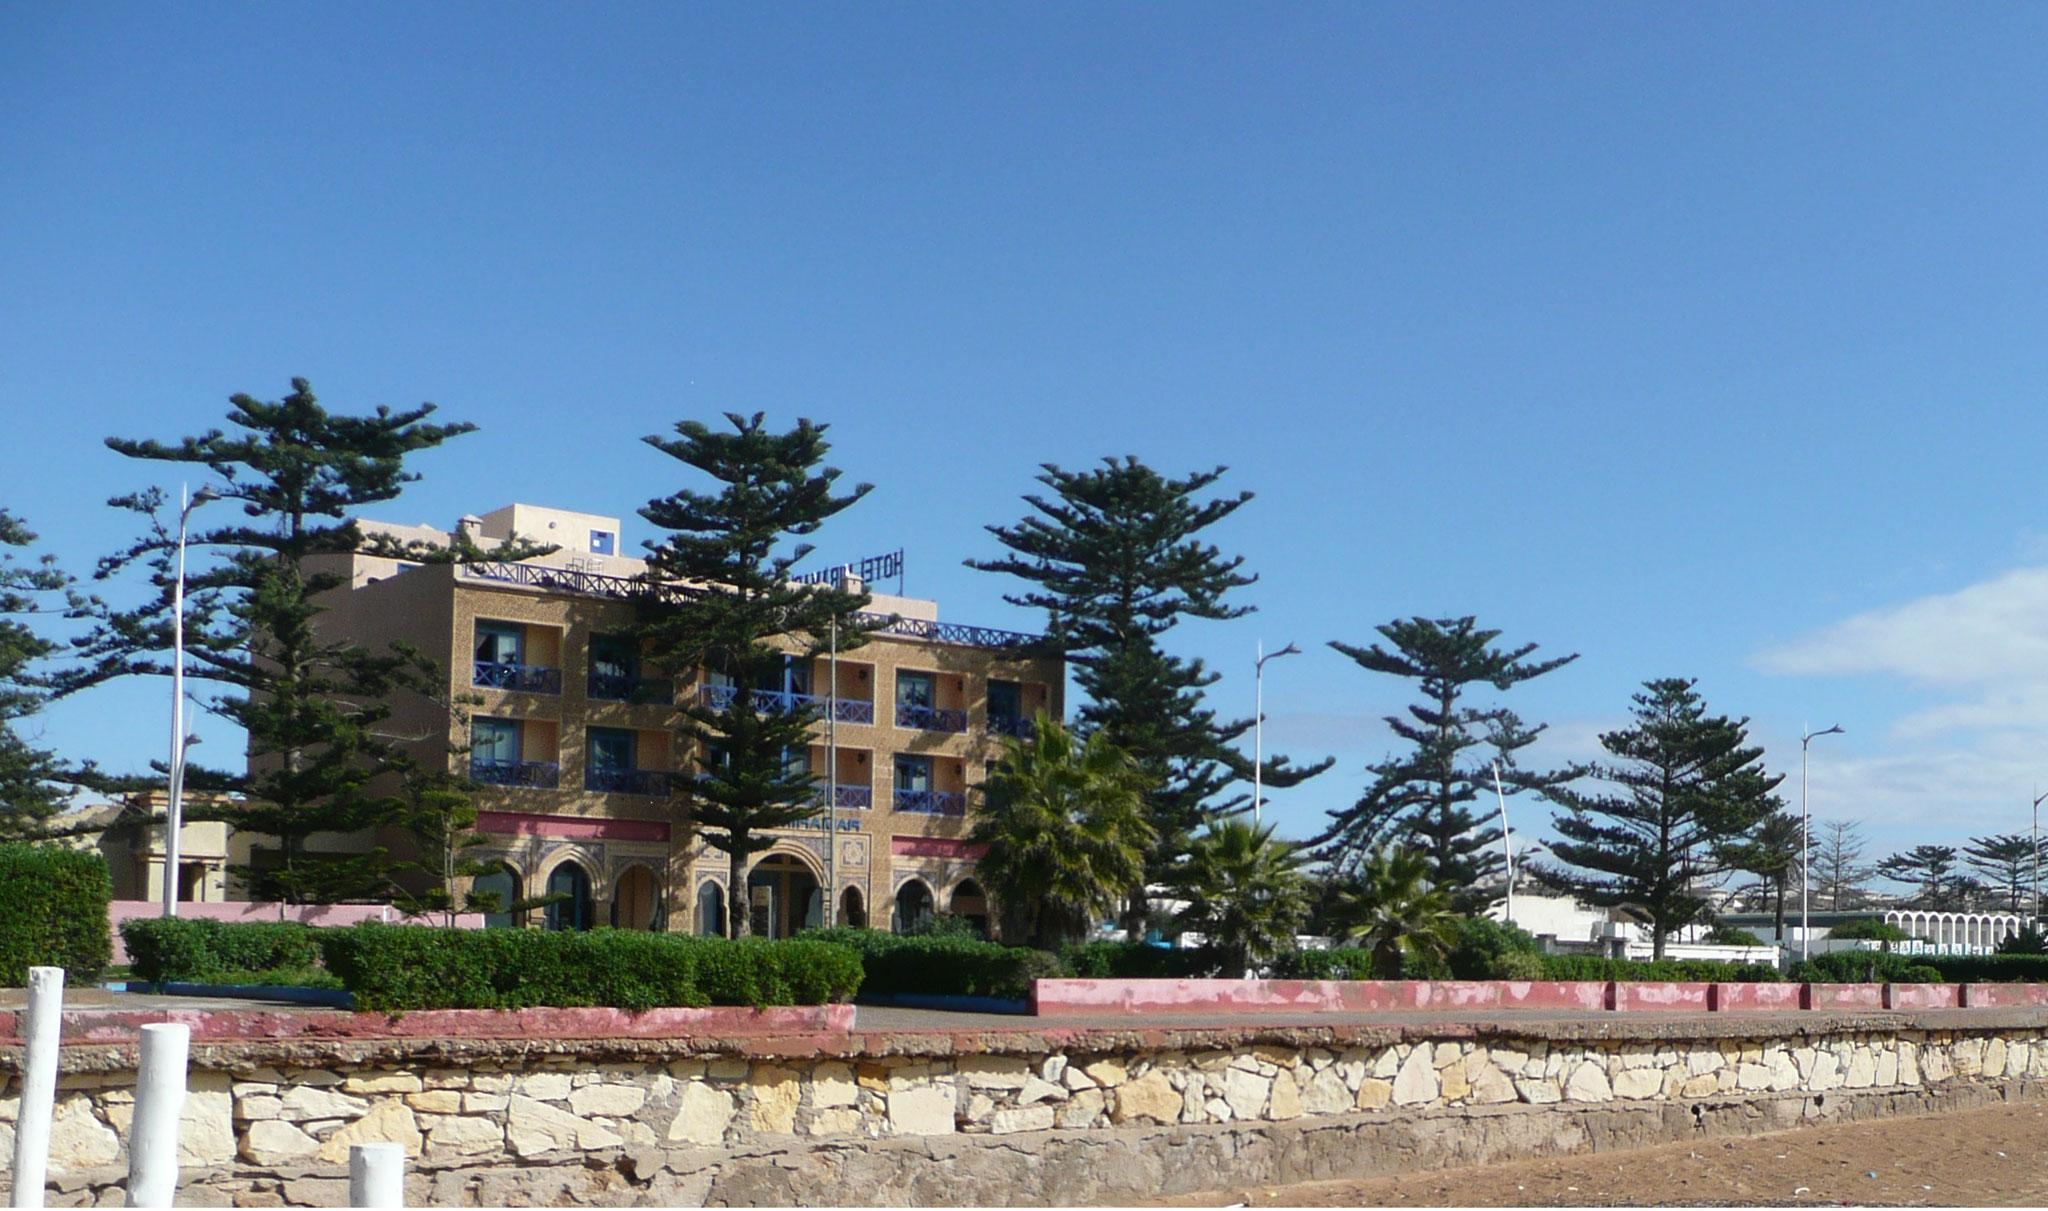 Essaouria - neues gepflegtes Hotel direkt am Strand